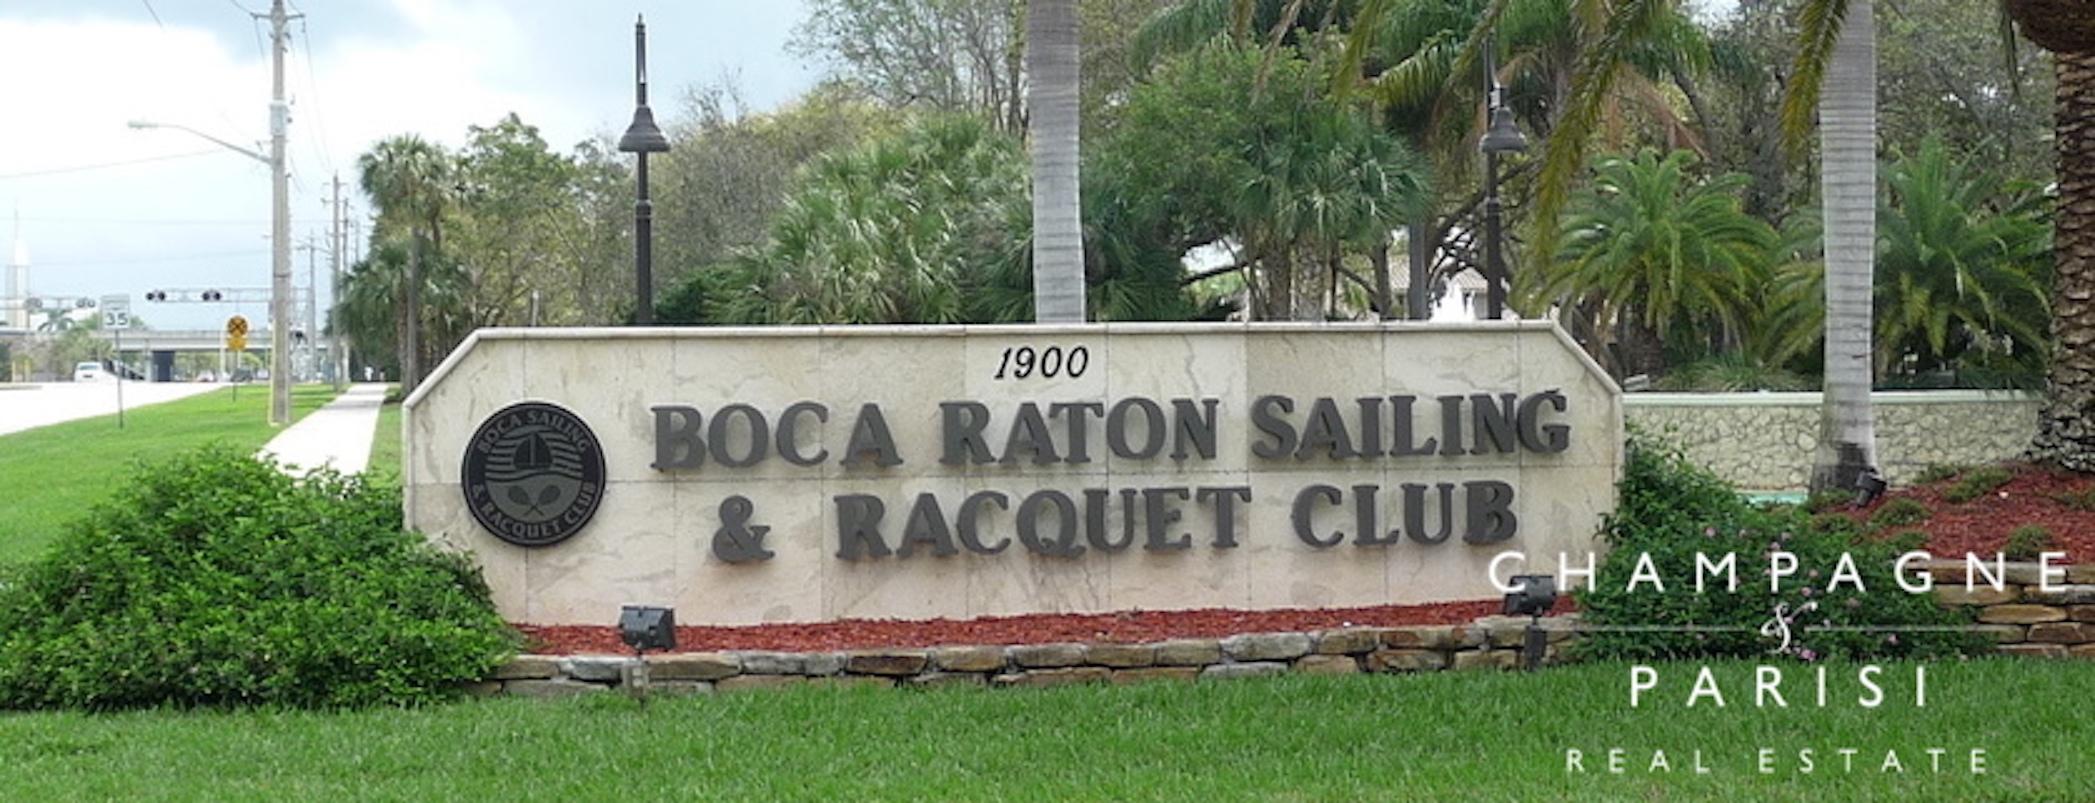 Boca Raton Sailing & Racquet Club